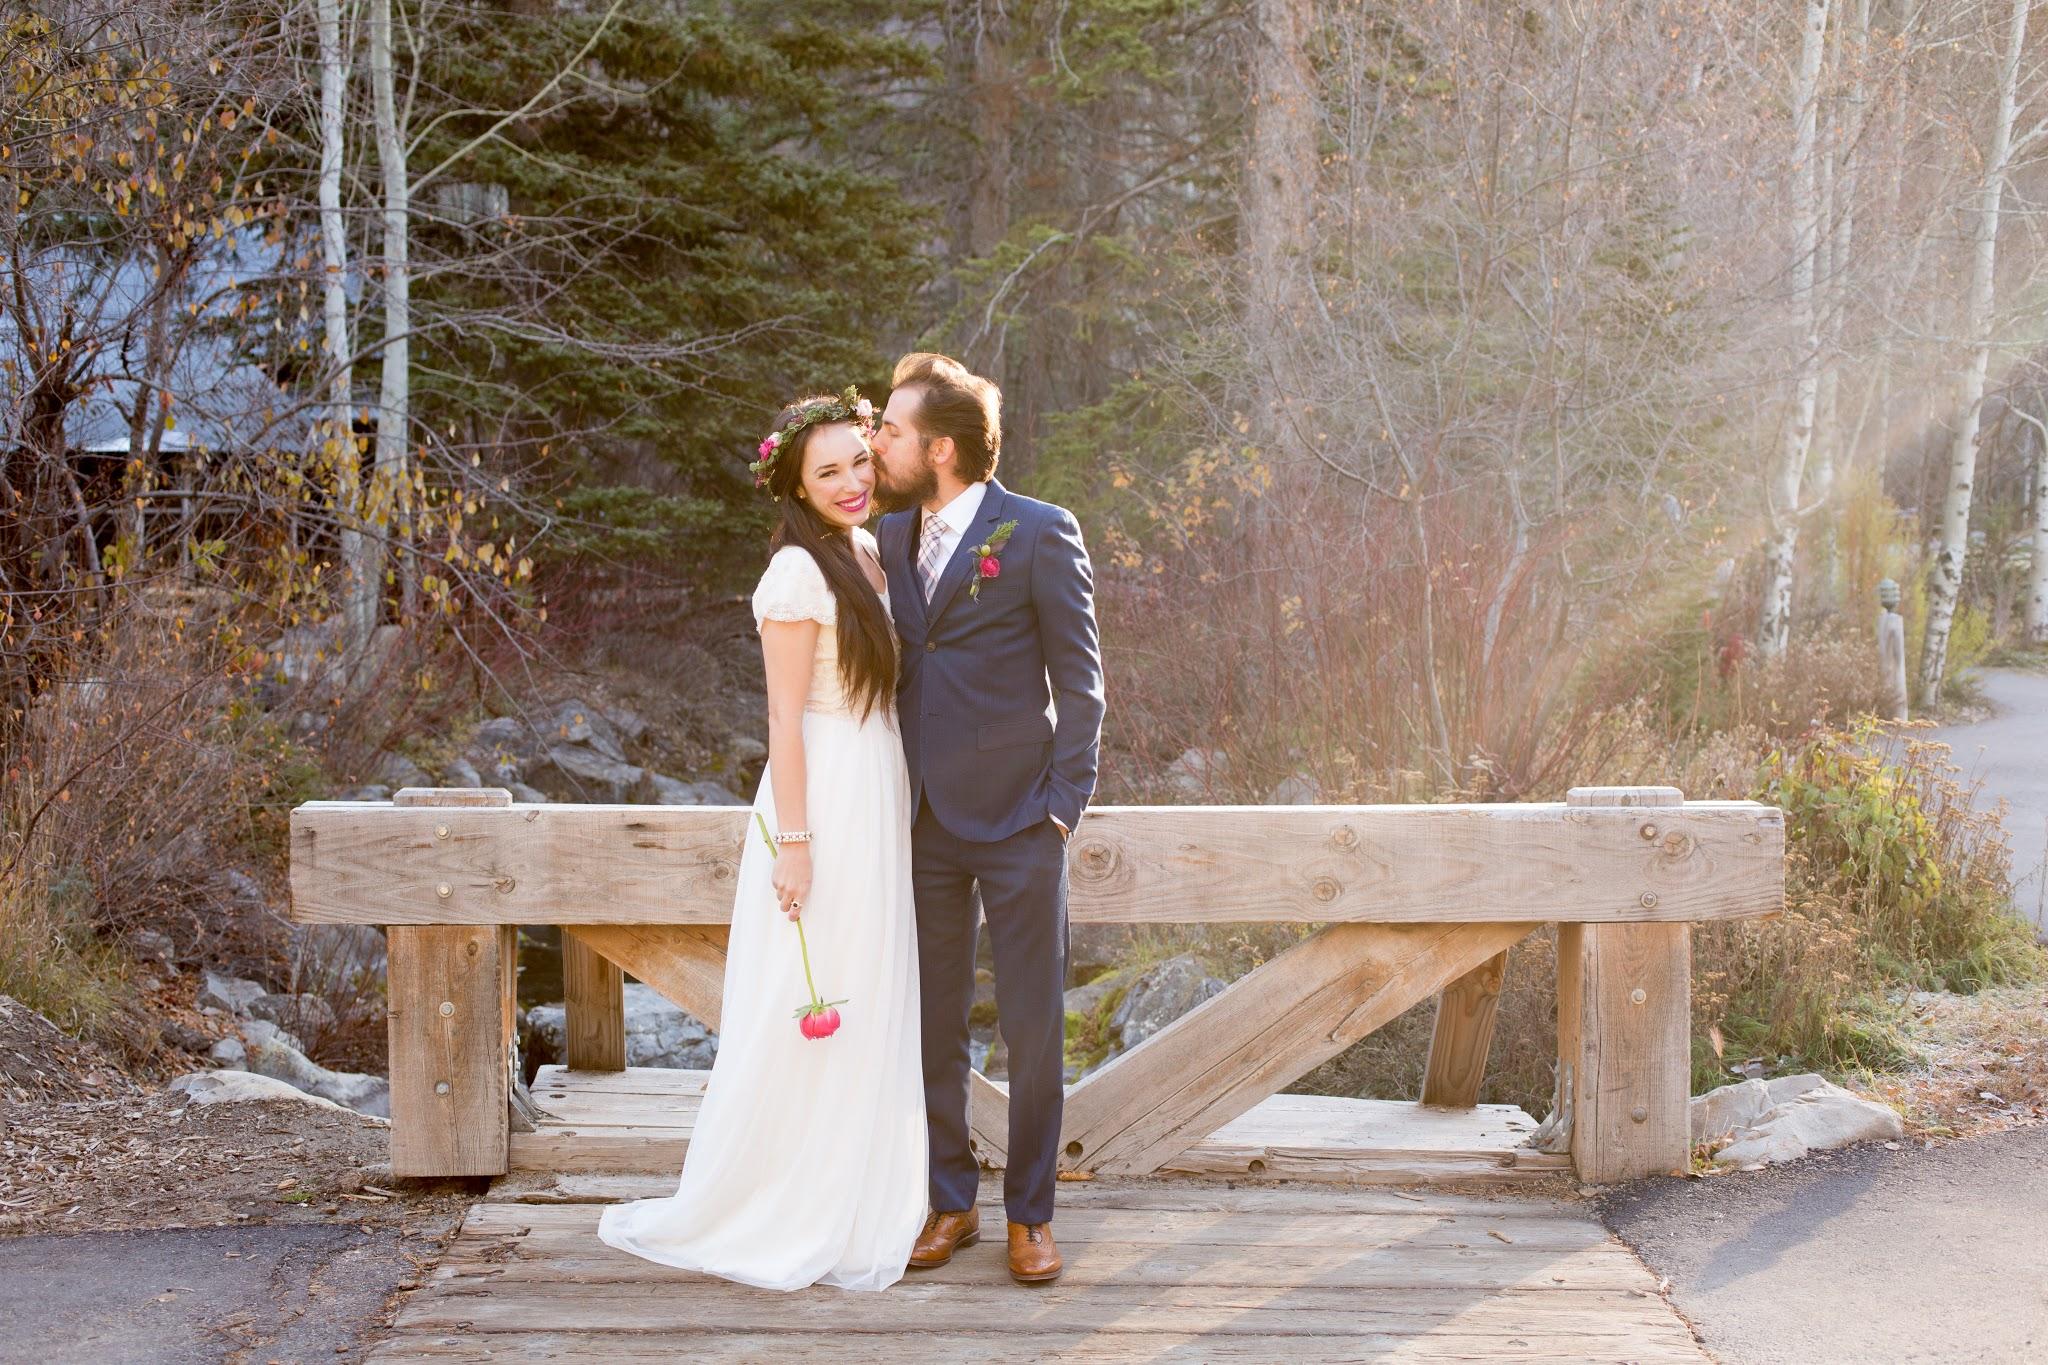 Wedding Shoot Bridal Photo Ideas